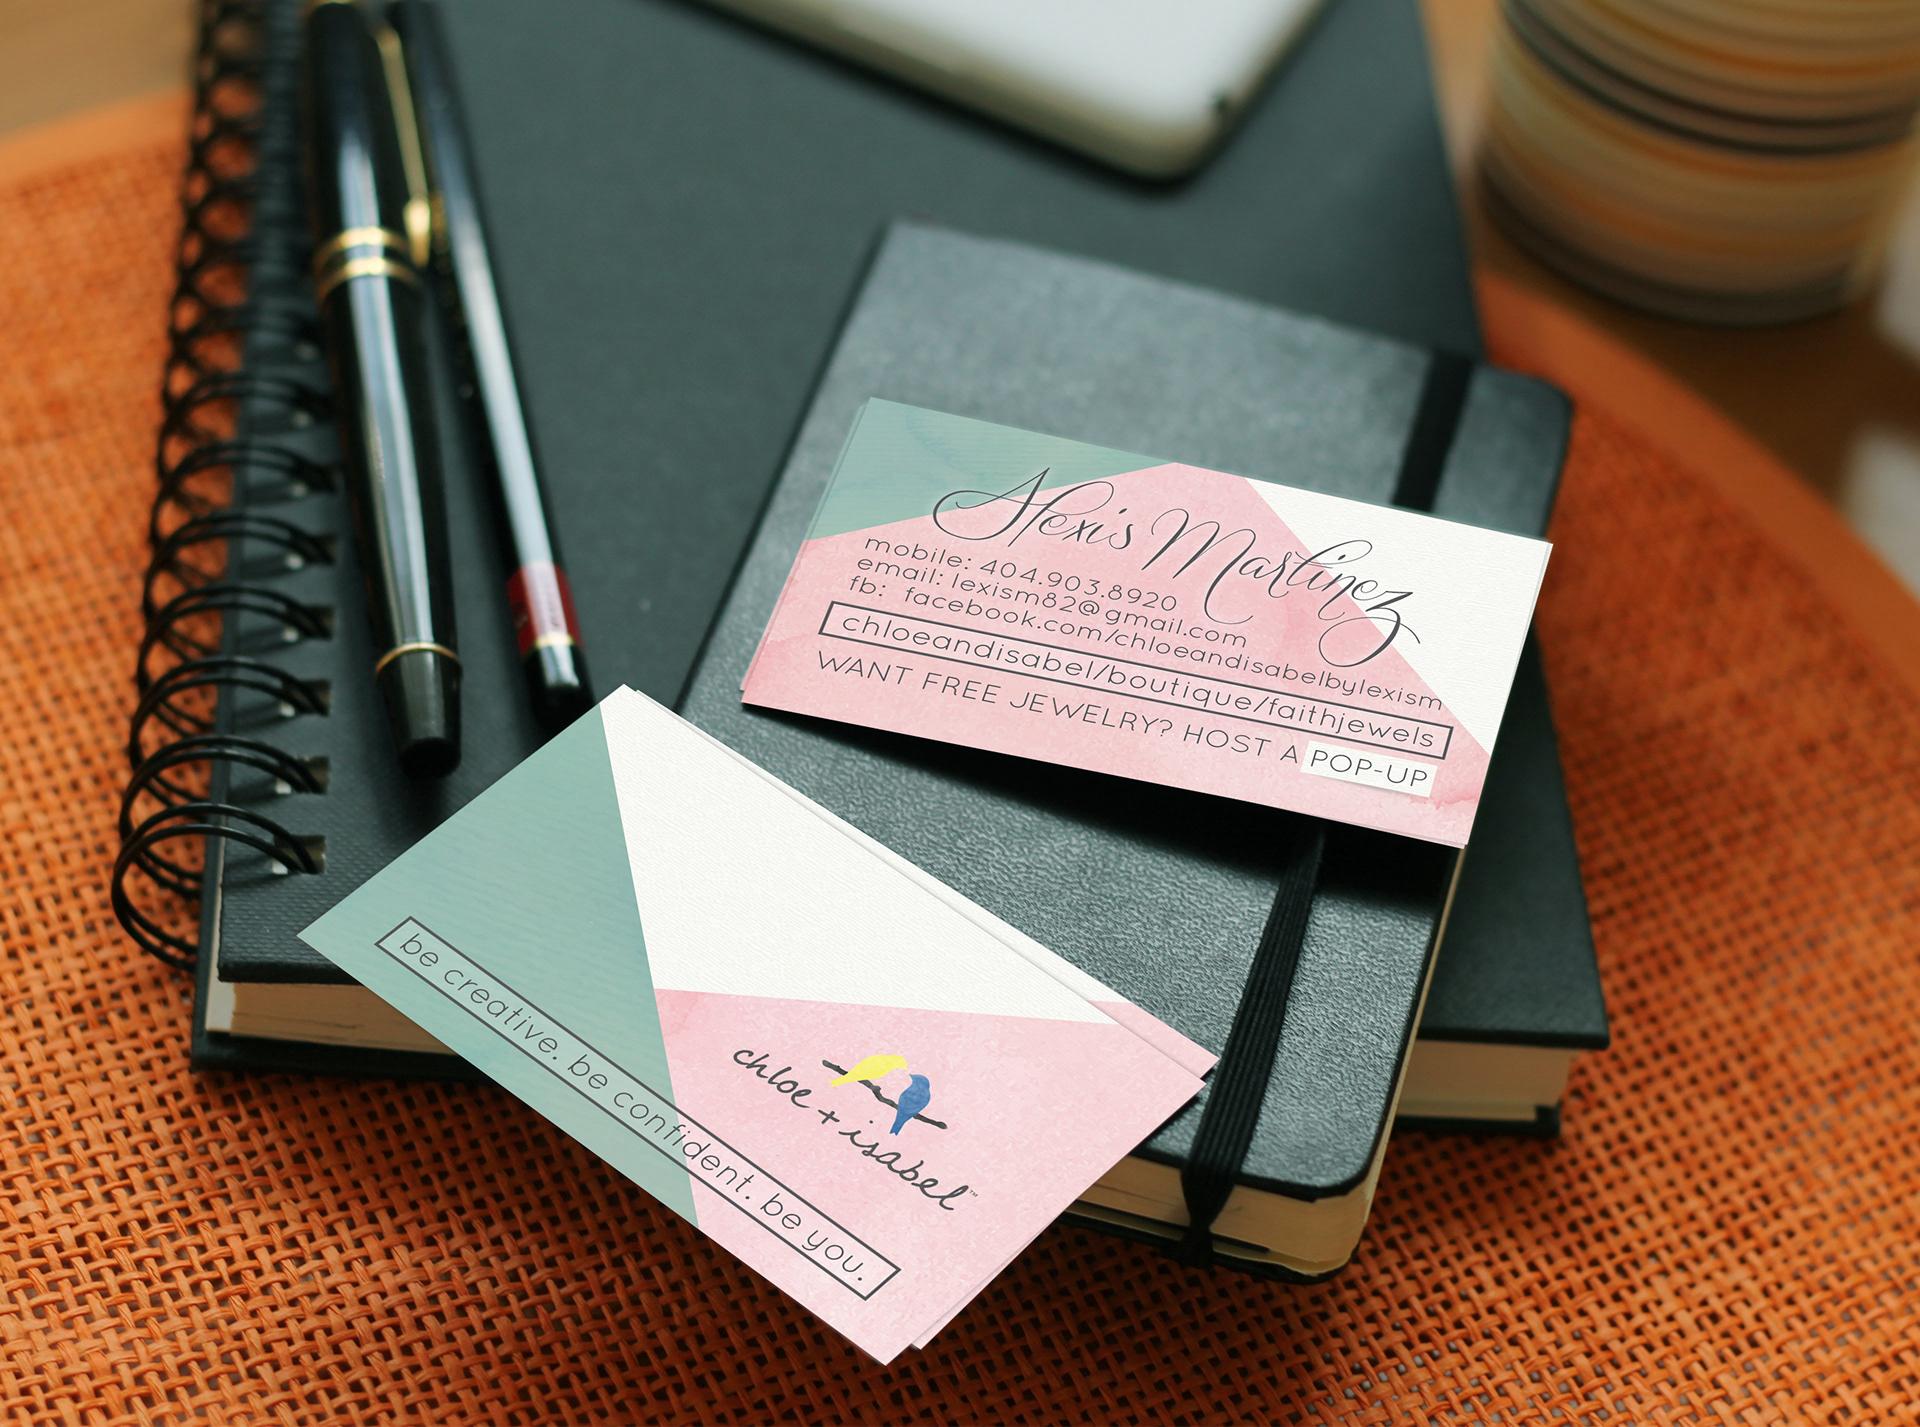 Lex gee alexis martinez business card magicingreecefo Gallery